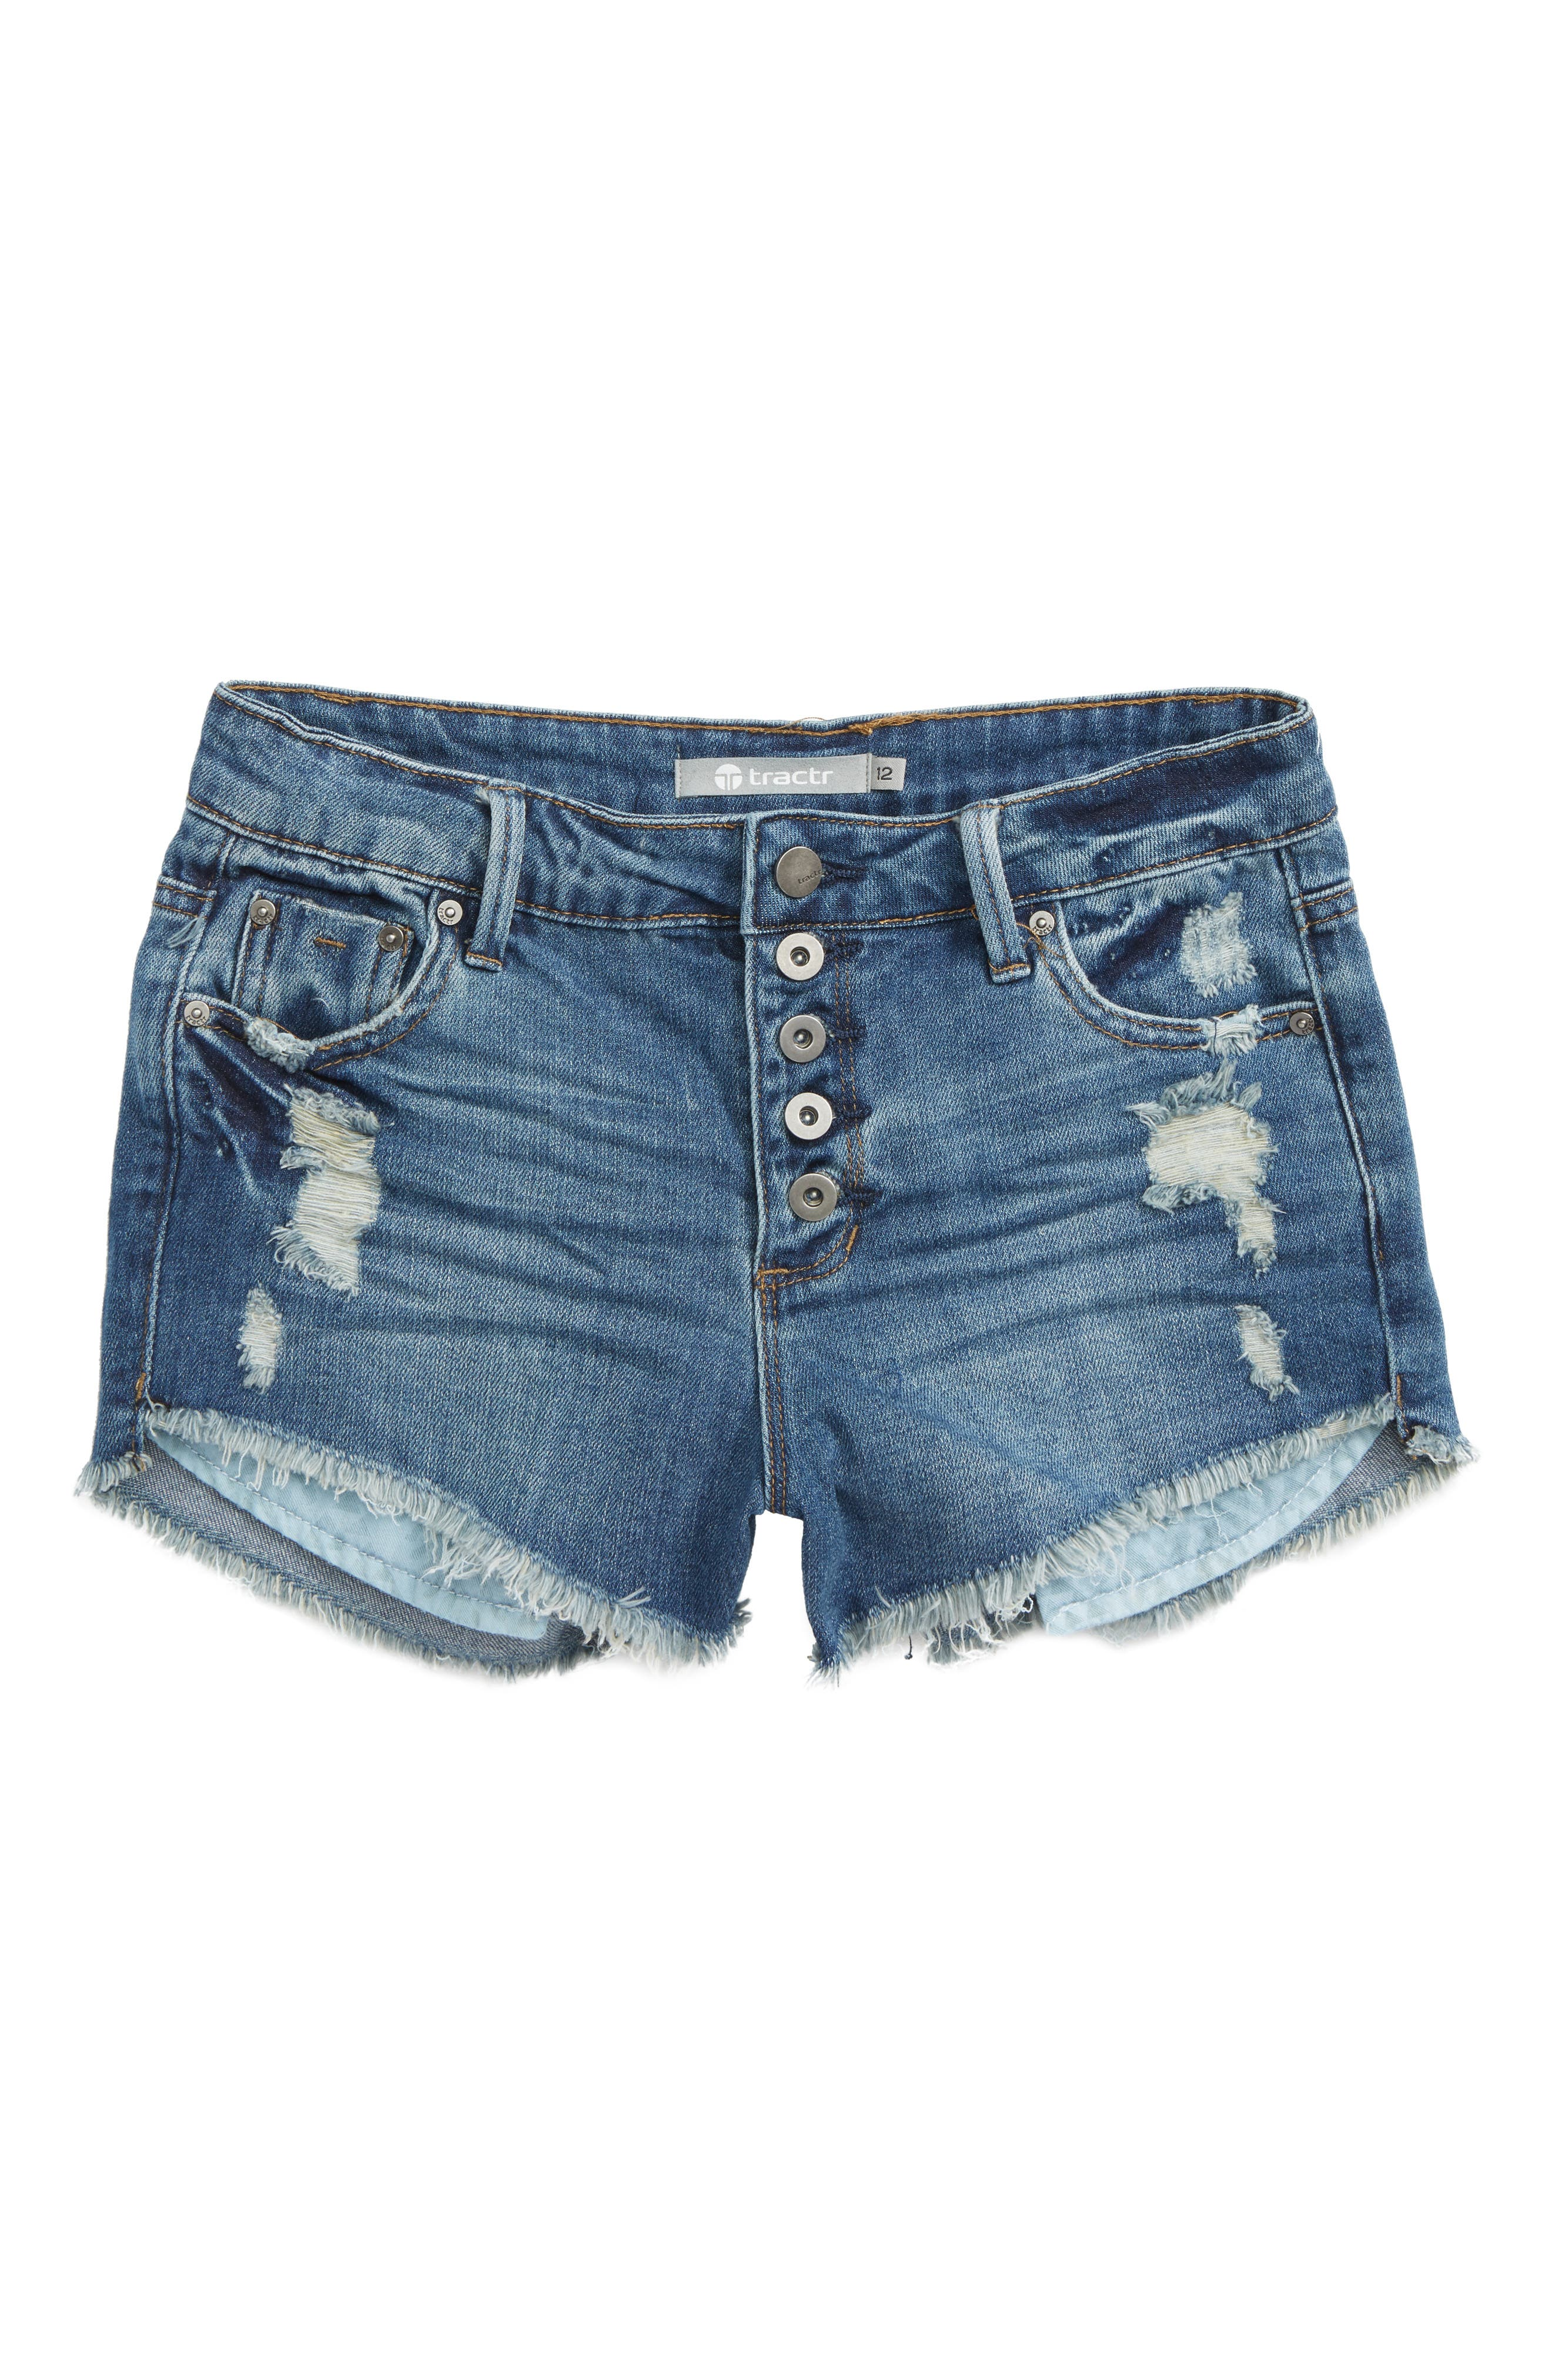 Fray Denim Shorts,                         Main,                         color, Indigo